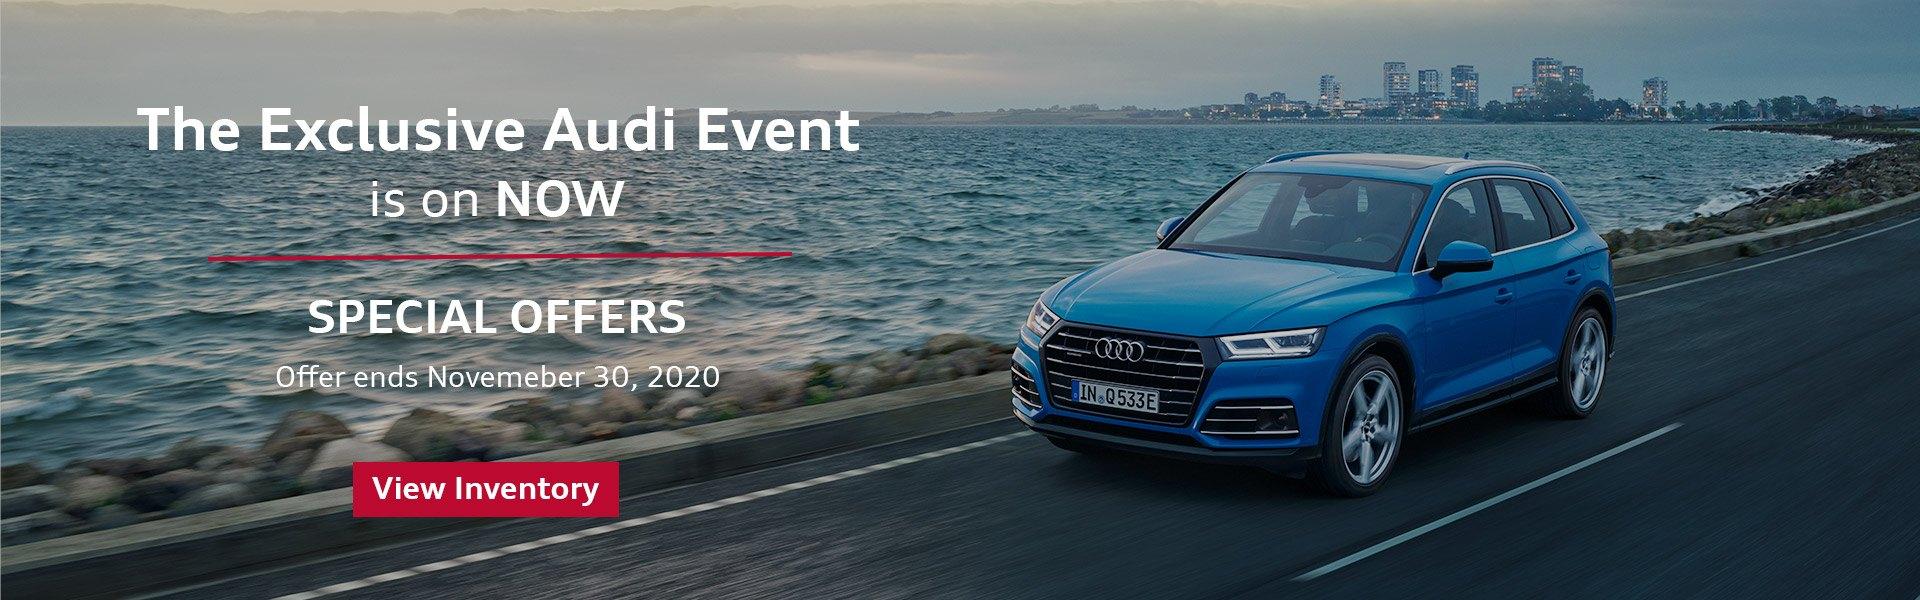 Audi Oct 2020 The Exclusive Audi Event